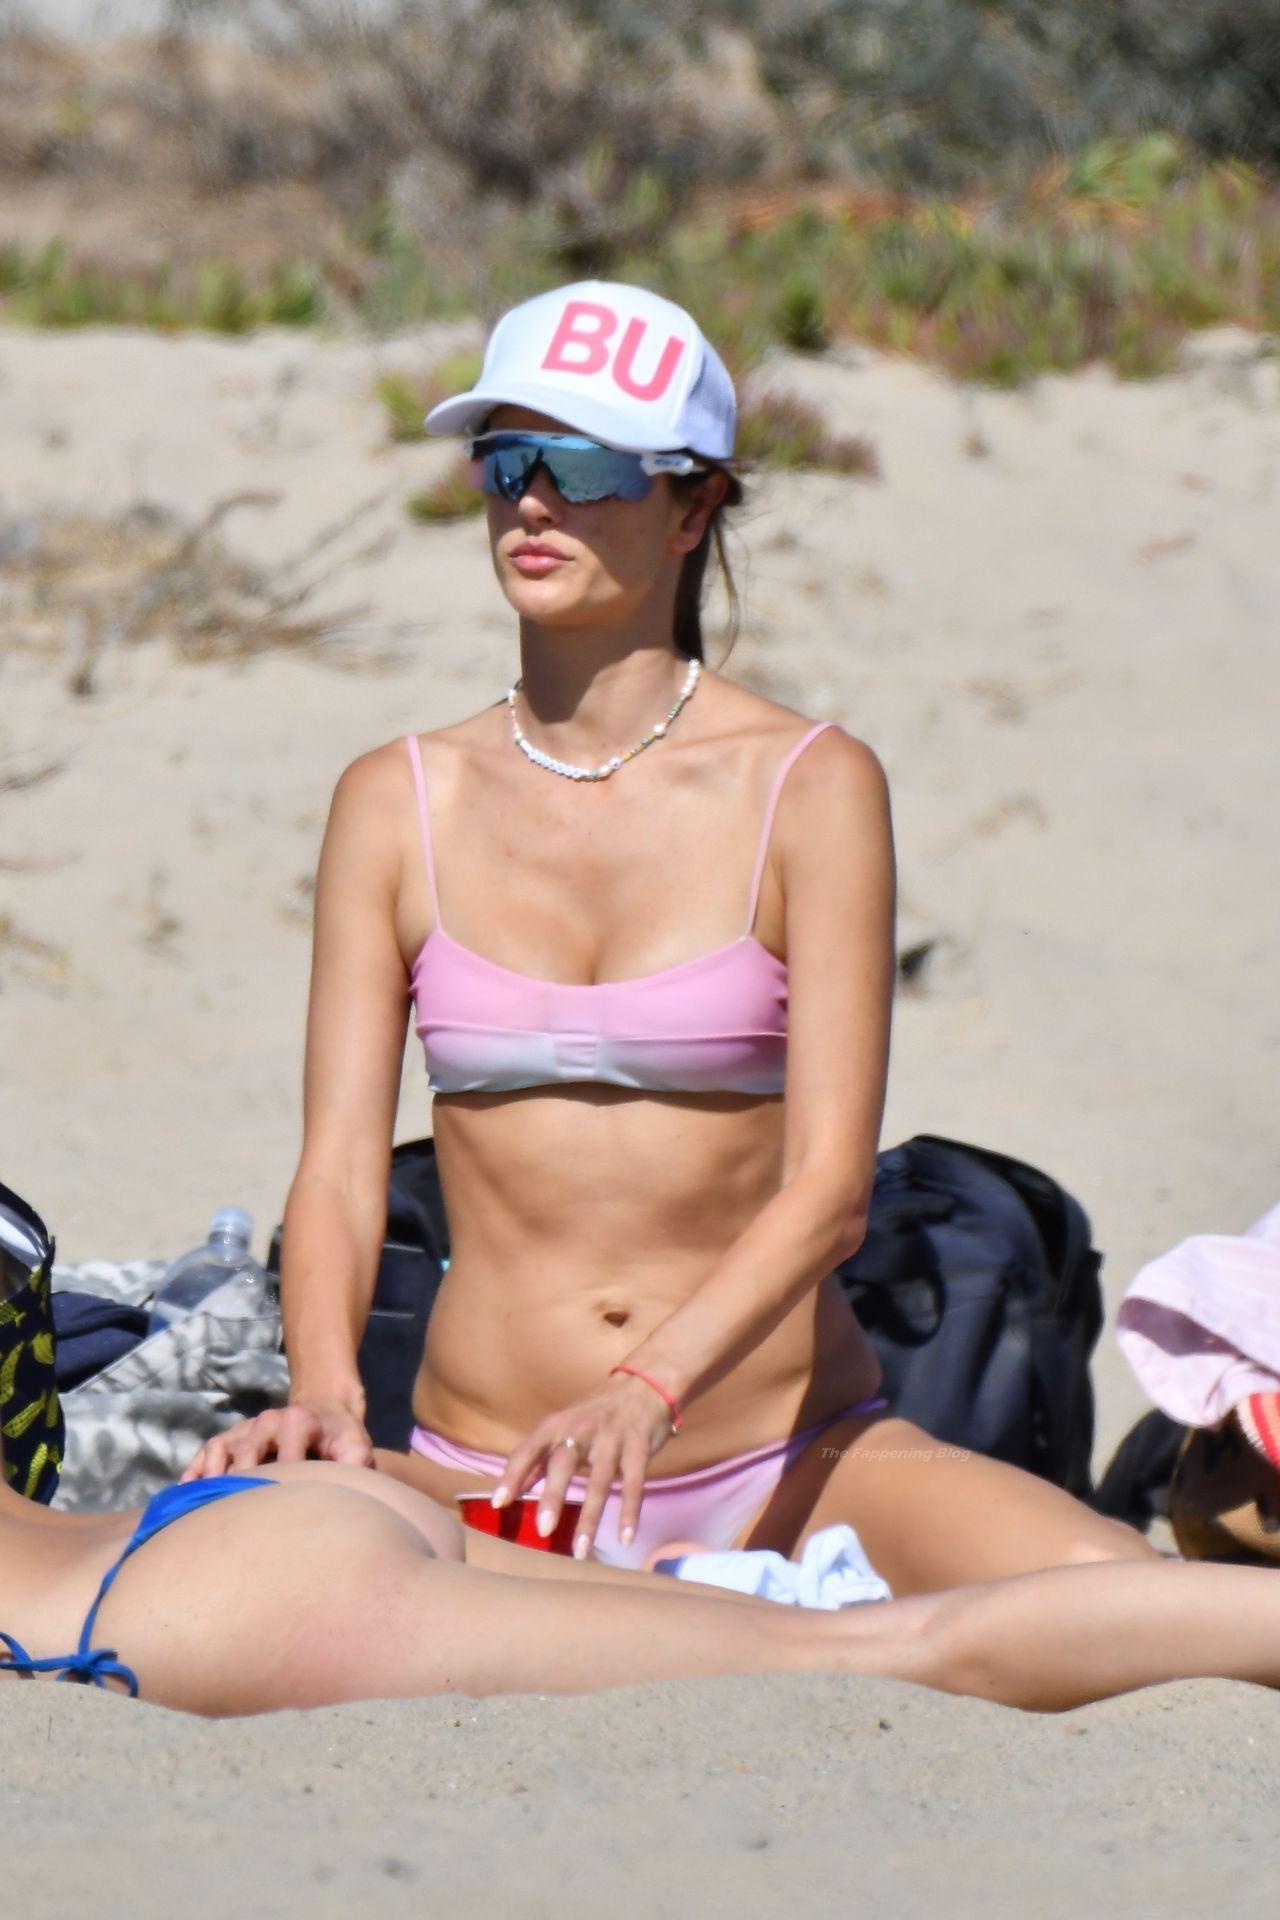 Alessandra-Ambrosio-Sexy-The-Fappening-Blog-73.jpg